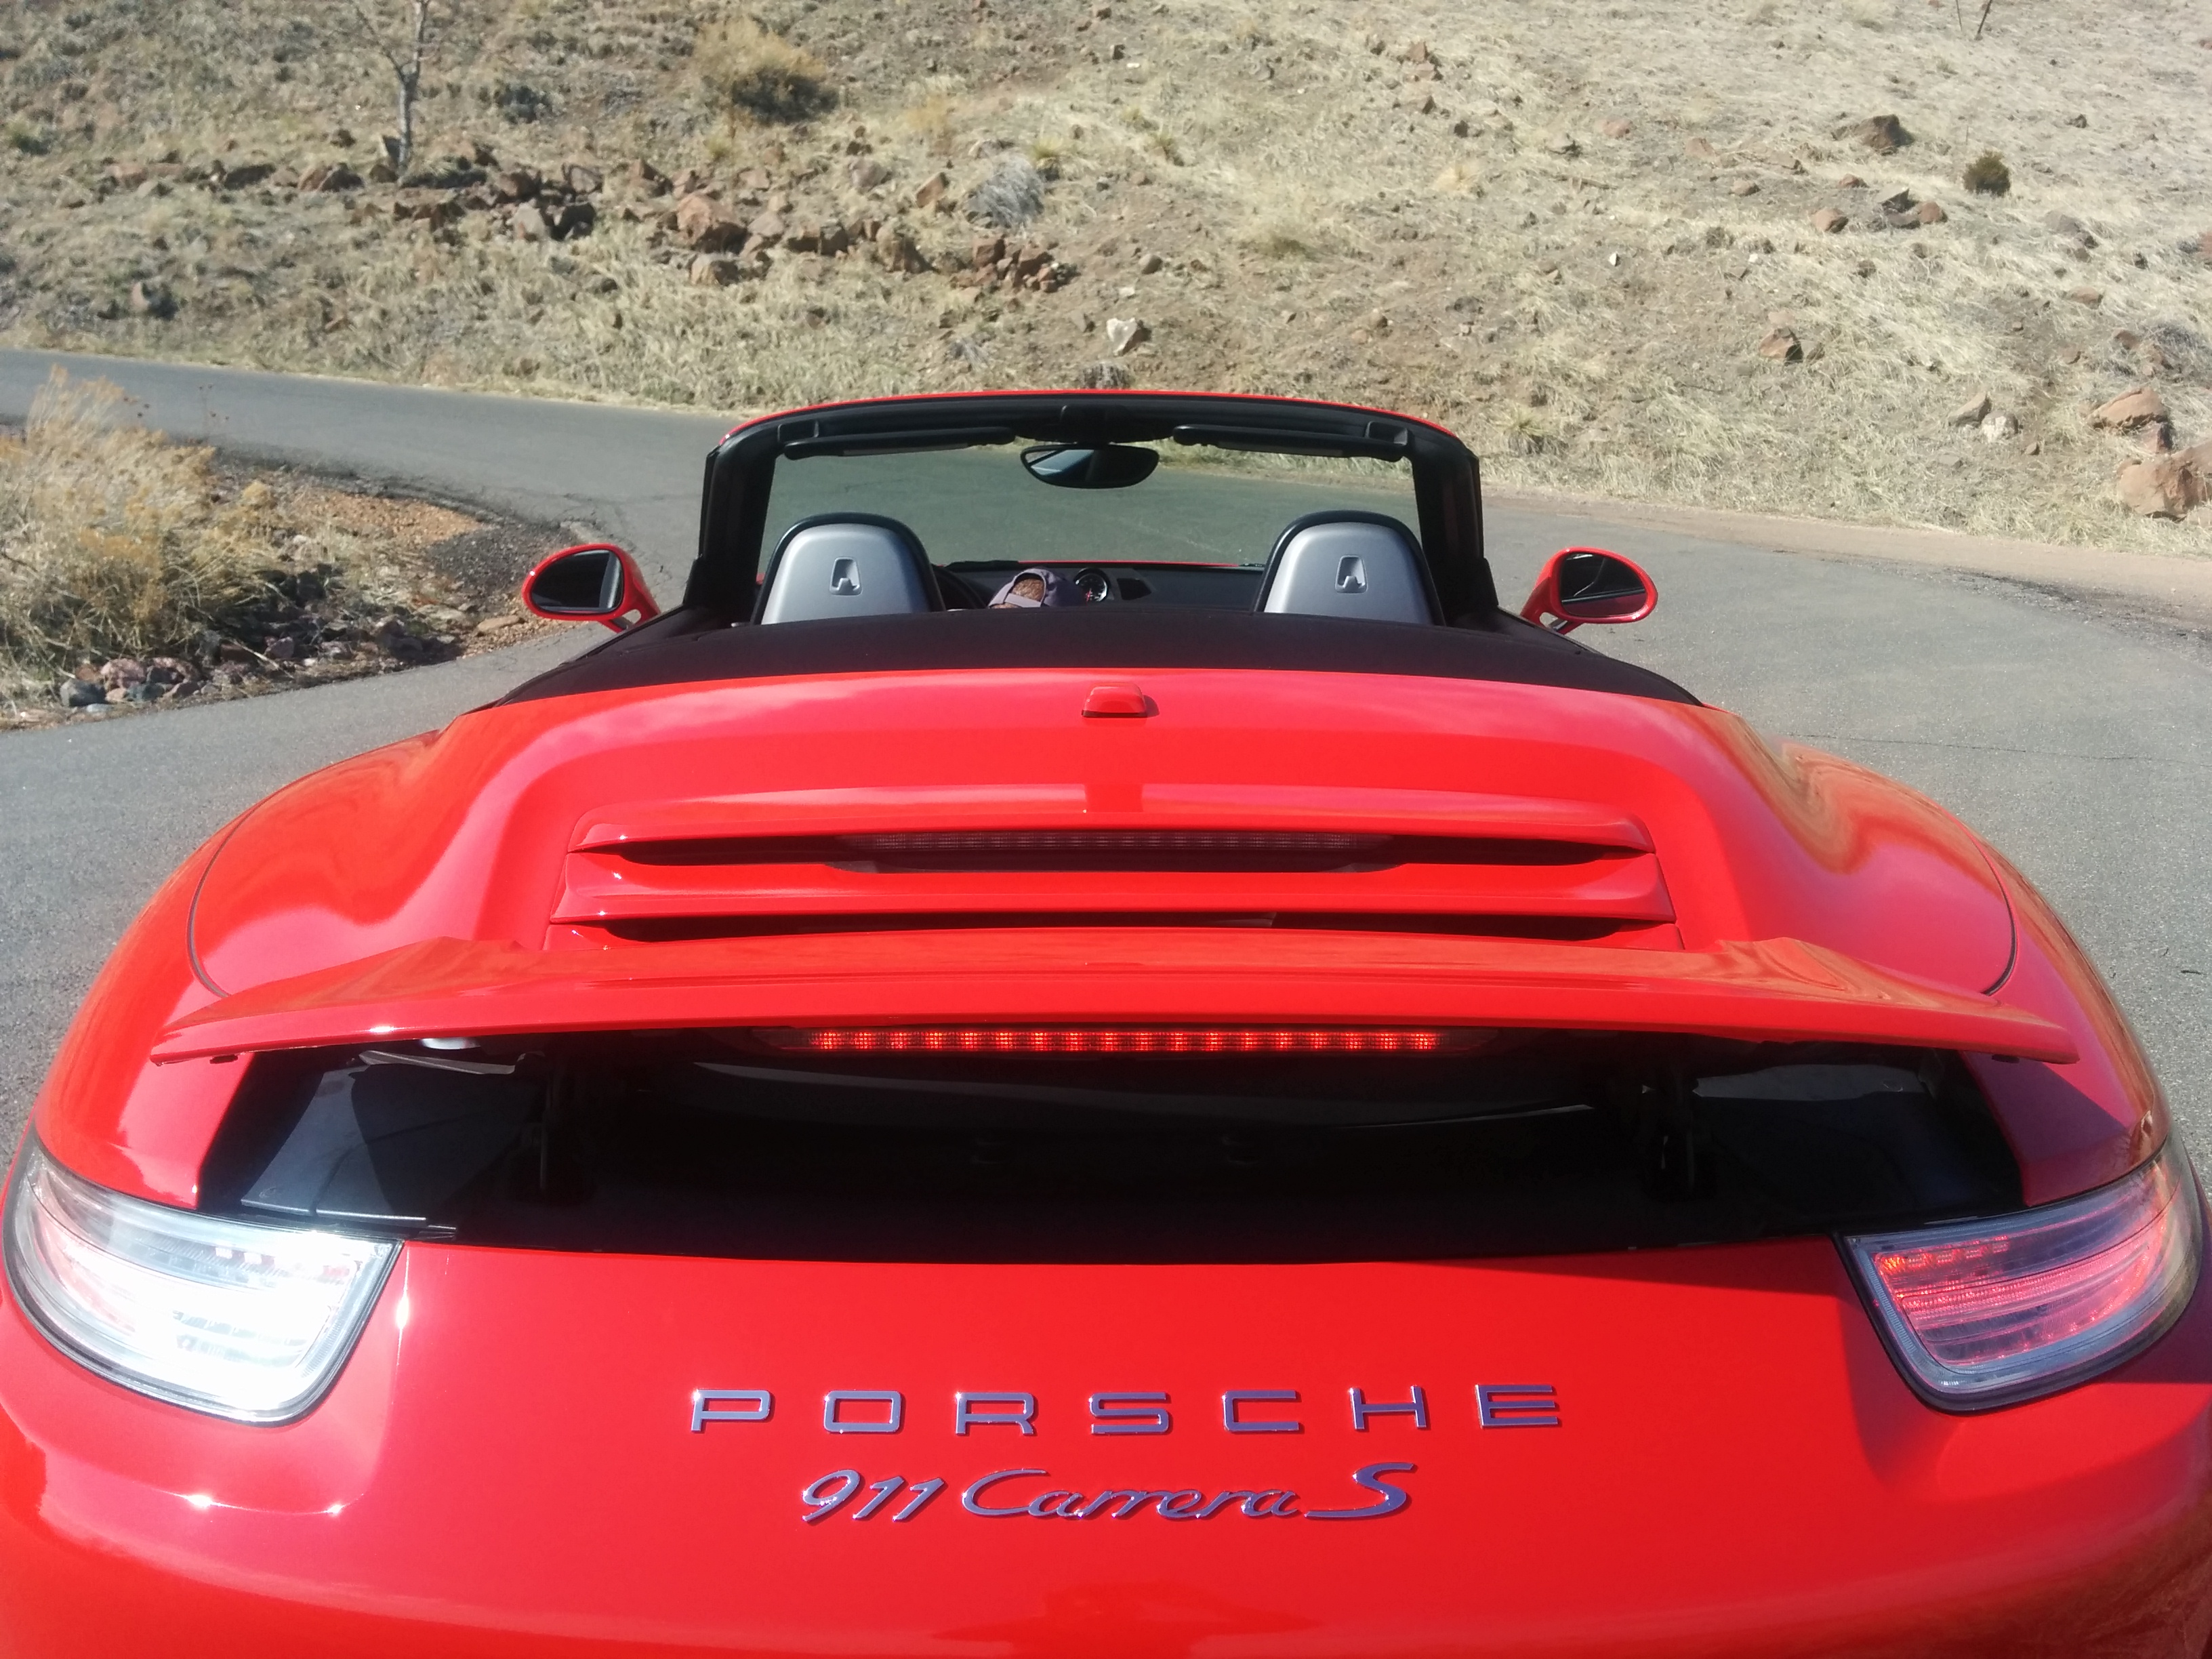 Porsche Carrera S Spoiler